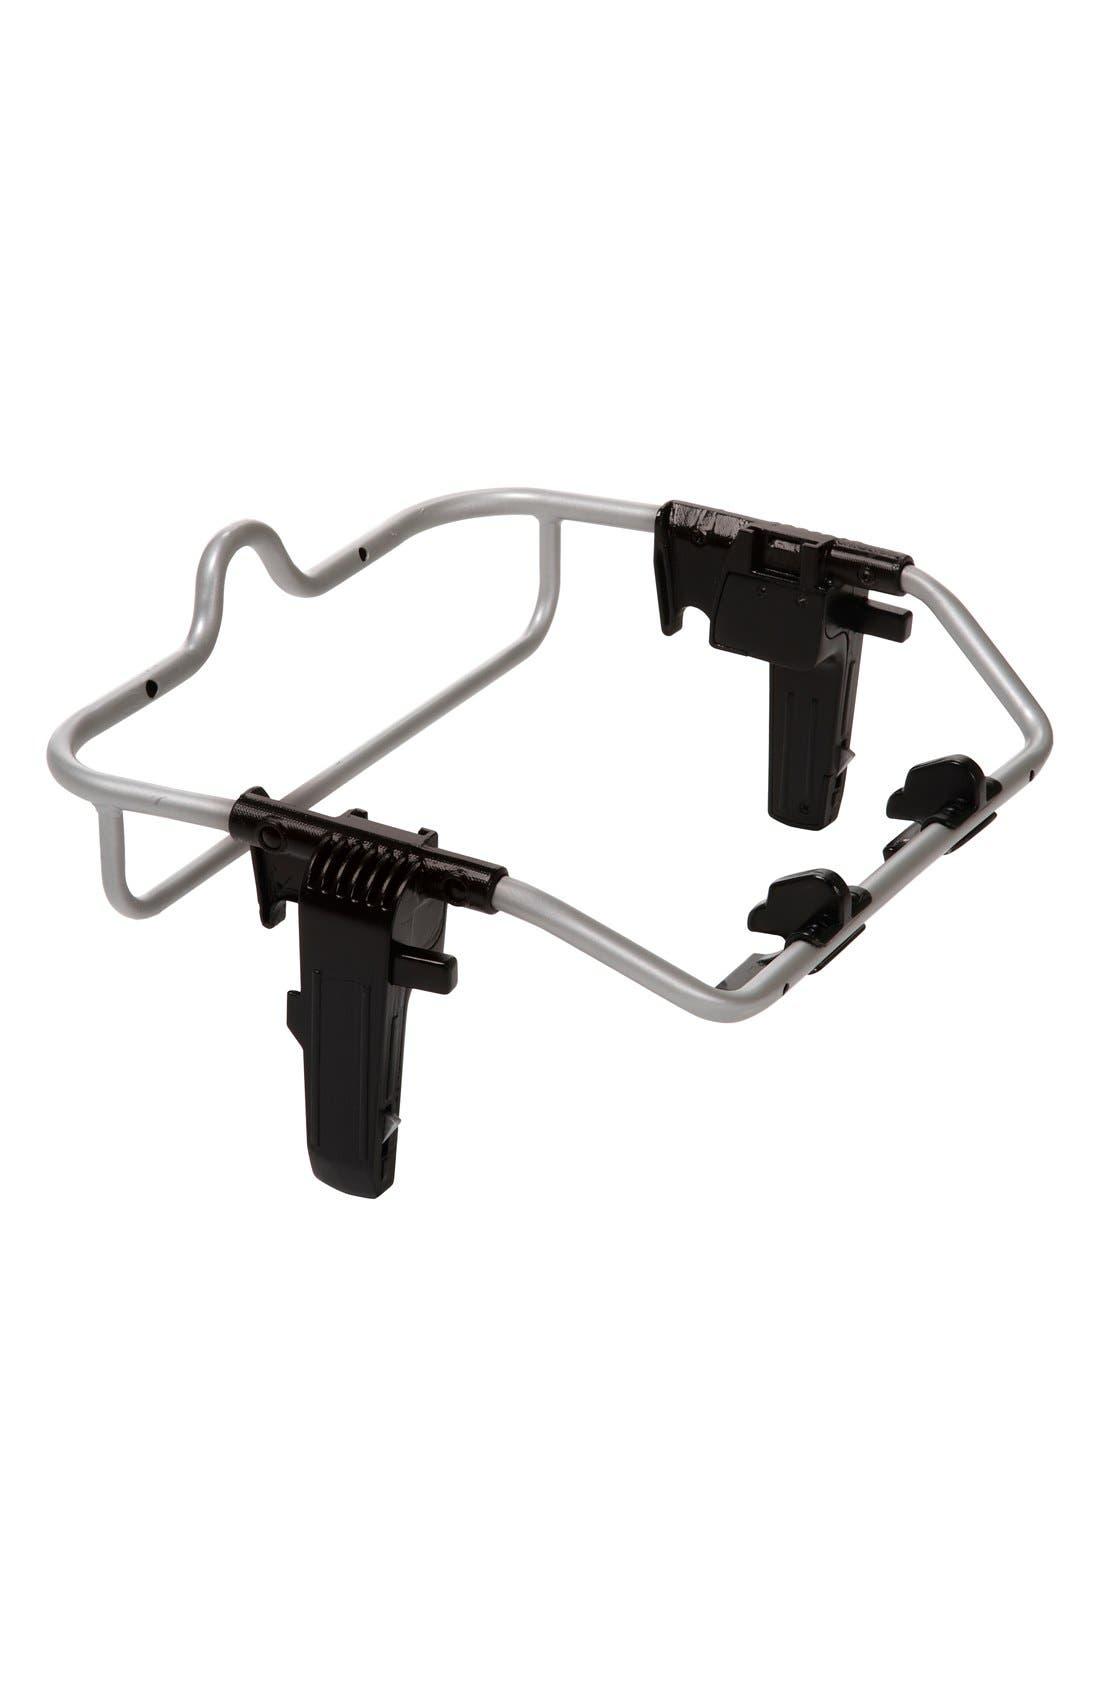 'Moodd' Multi Model Car Seat Adapter,                             Main thumbnail 1, color,                             Black